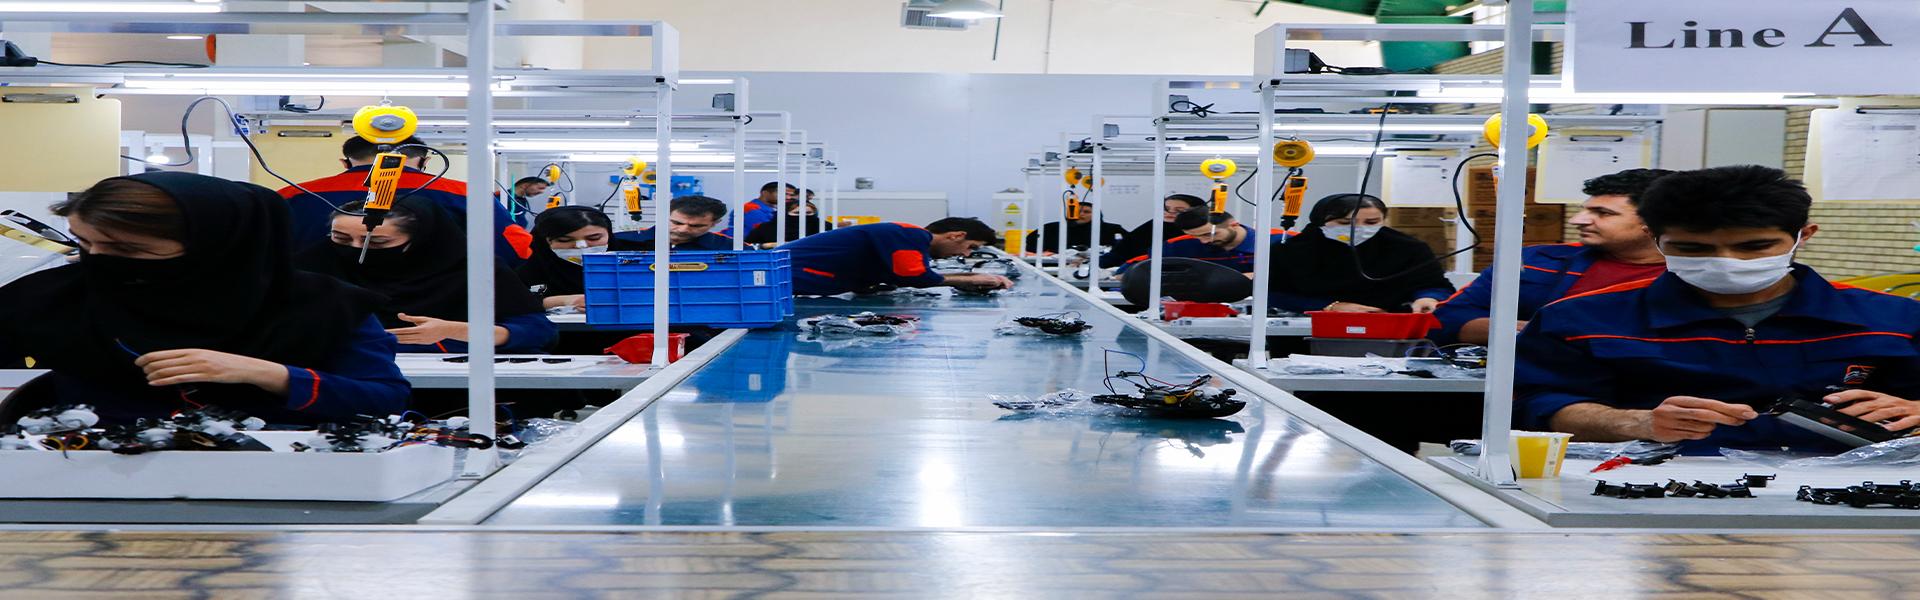 خط تولید شرکت پیشرو سورین فنآور فرتاک